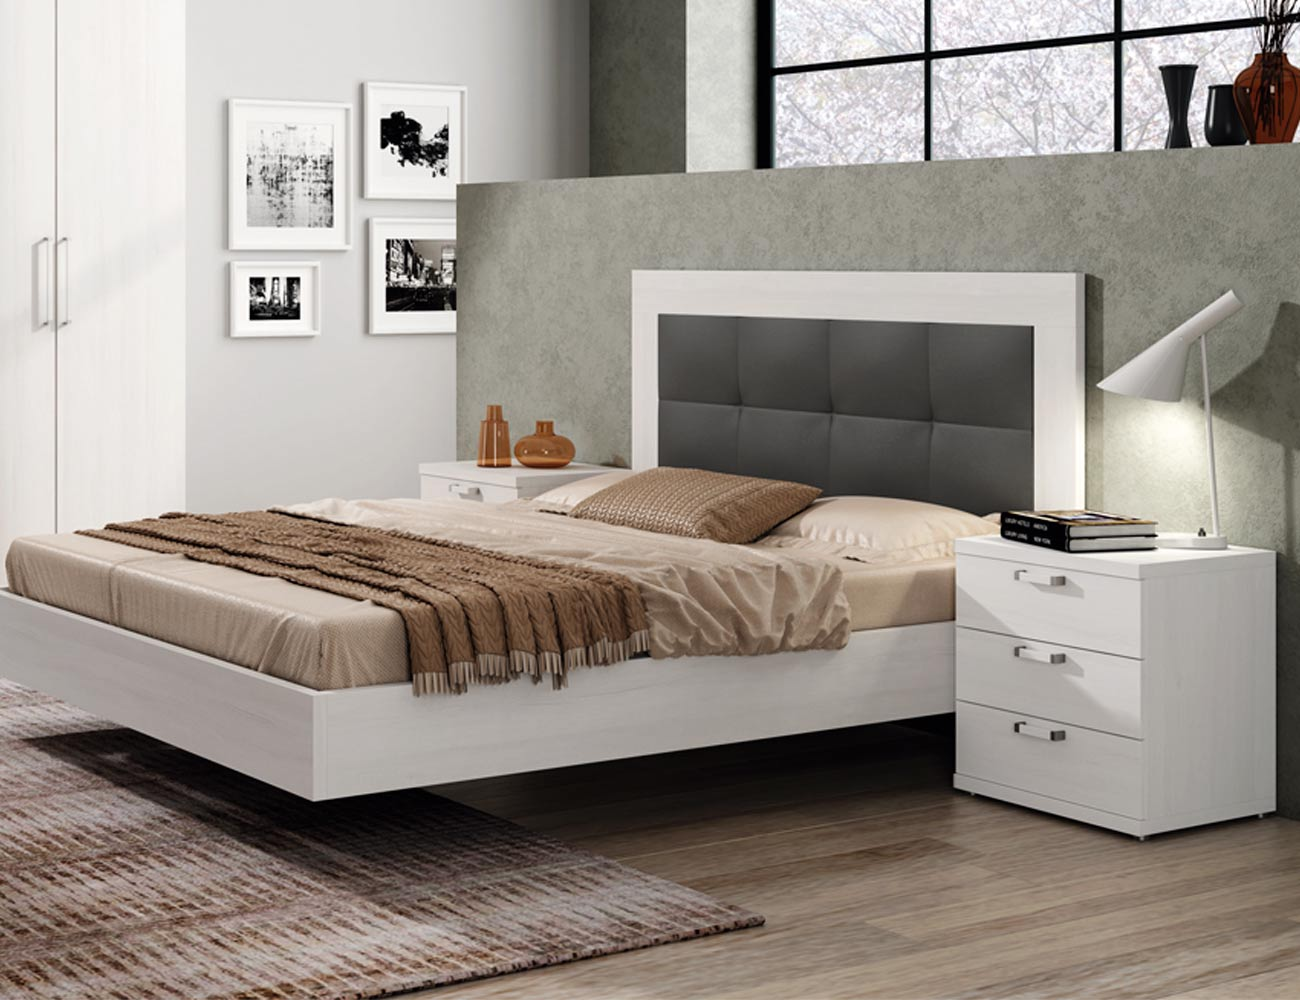 469 dormitorio matrimonio cabecero tapizado antracita color polar1